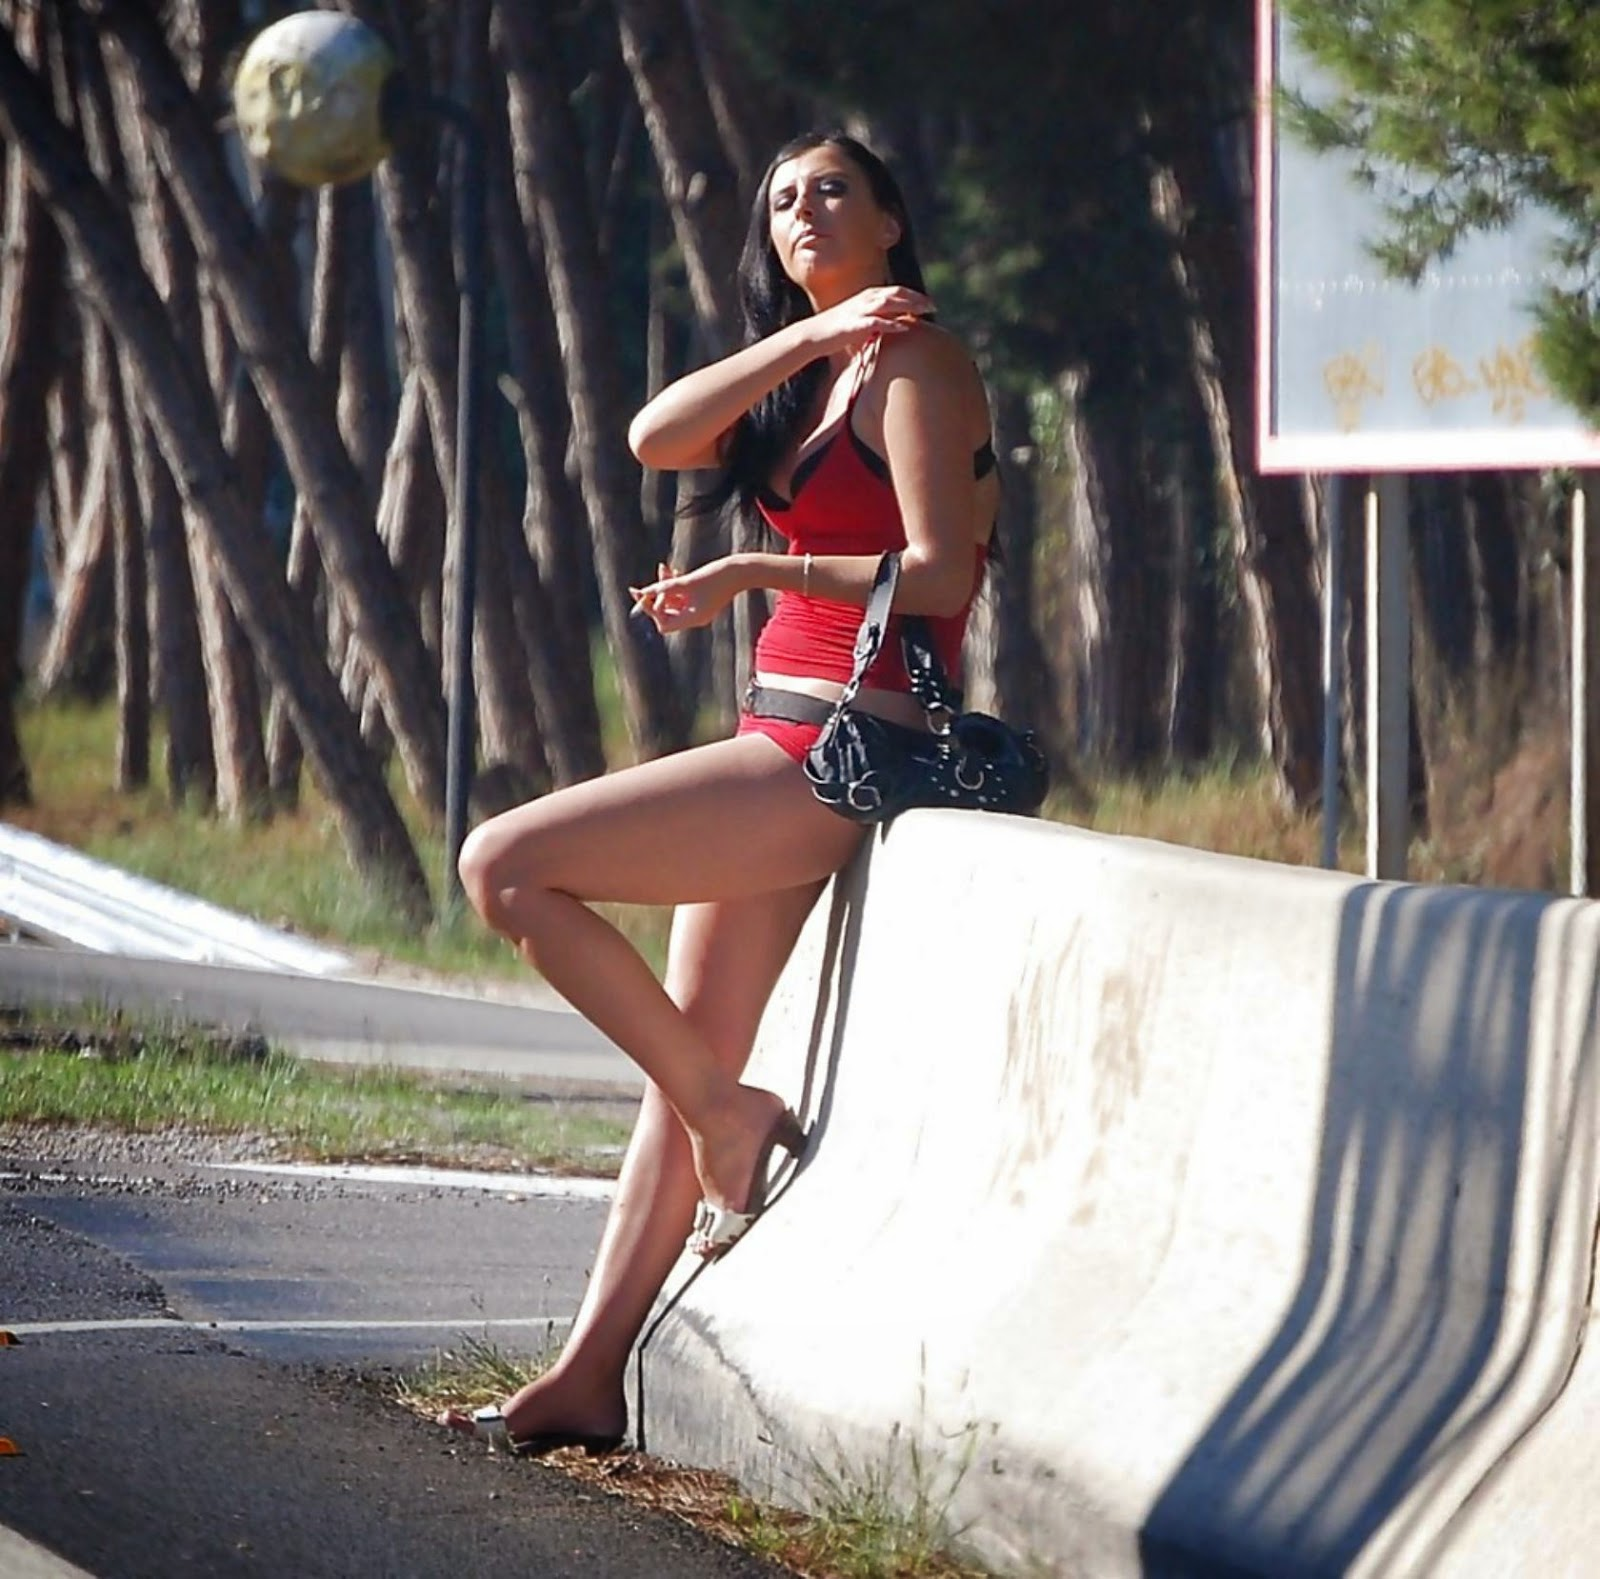 prostitutas en benicarlo asesinatos de prostitutas españa